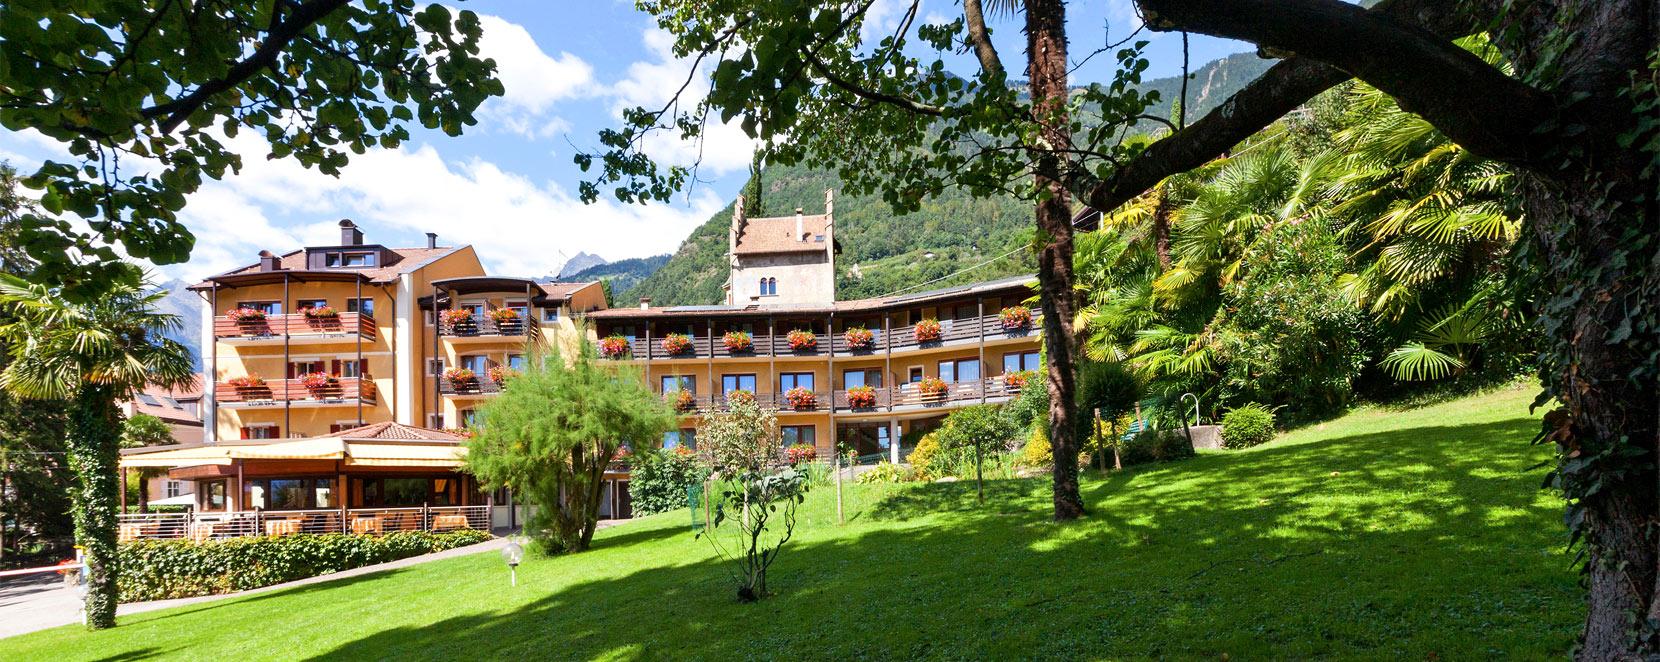 Hotel Dorf Tirol Meran Hotel Thurnergut S